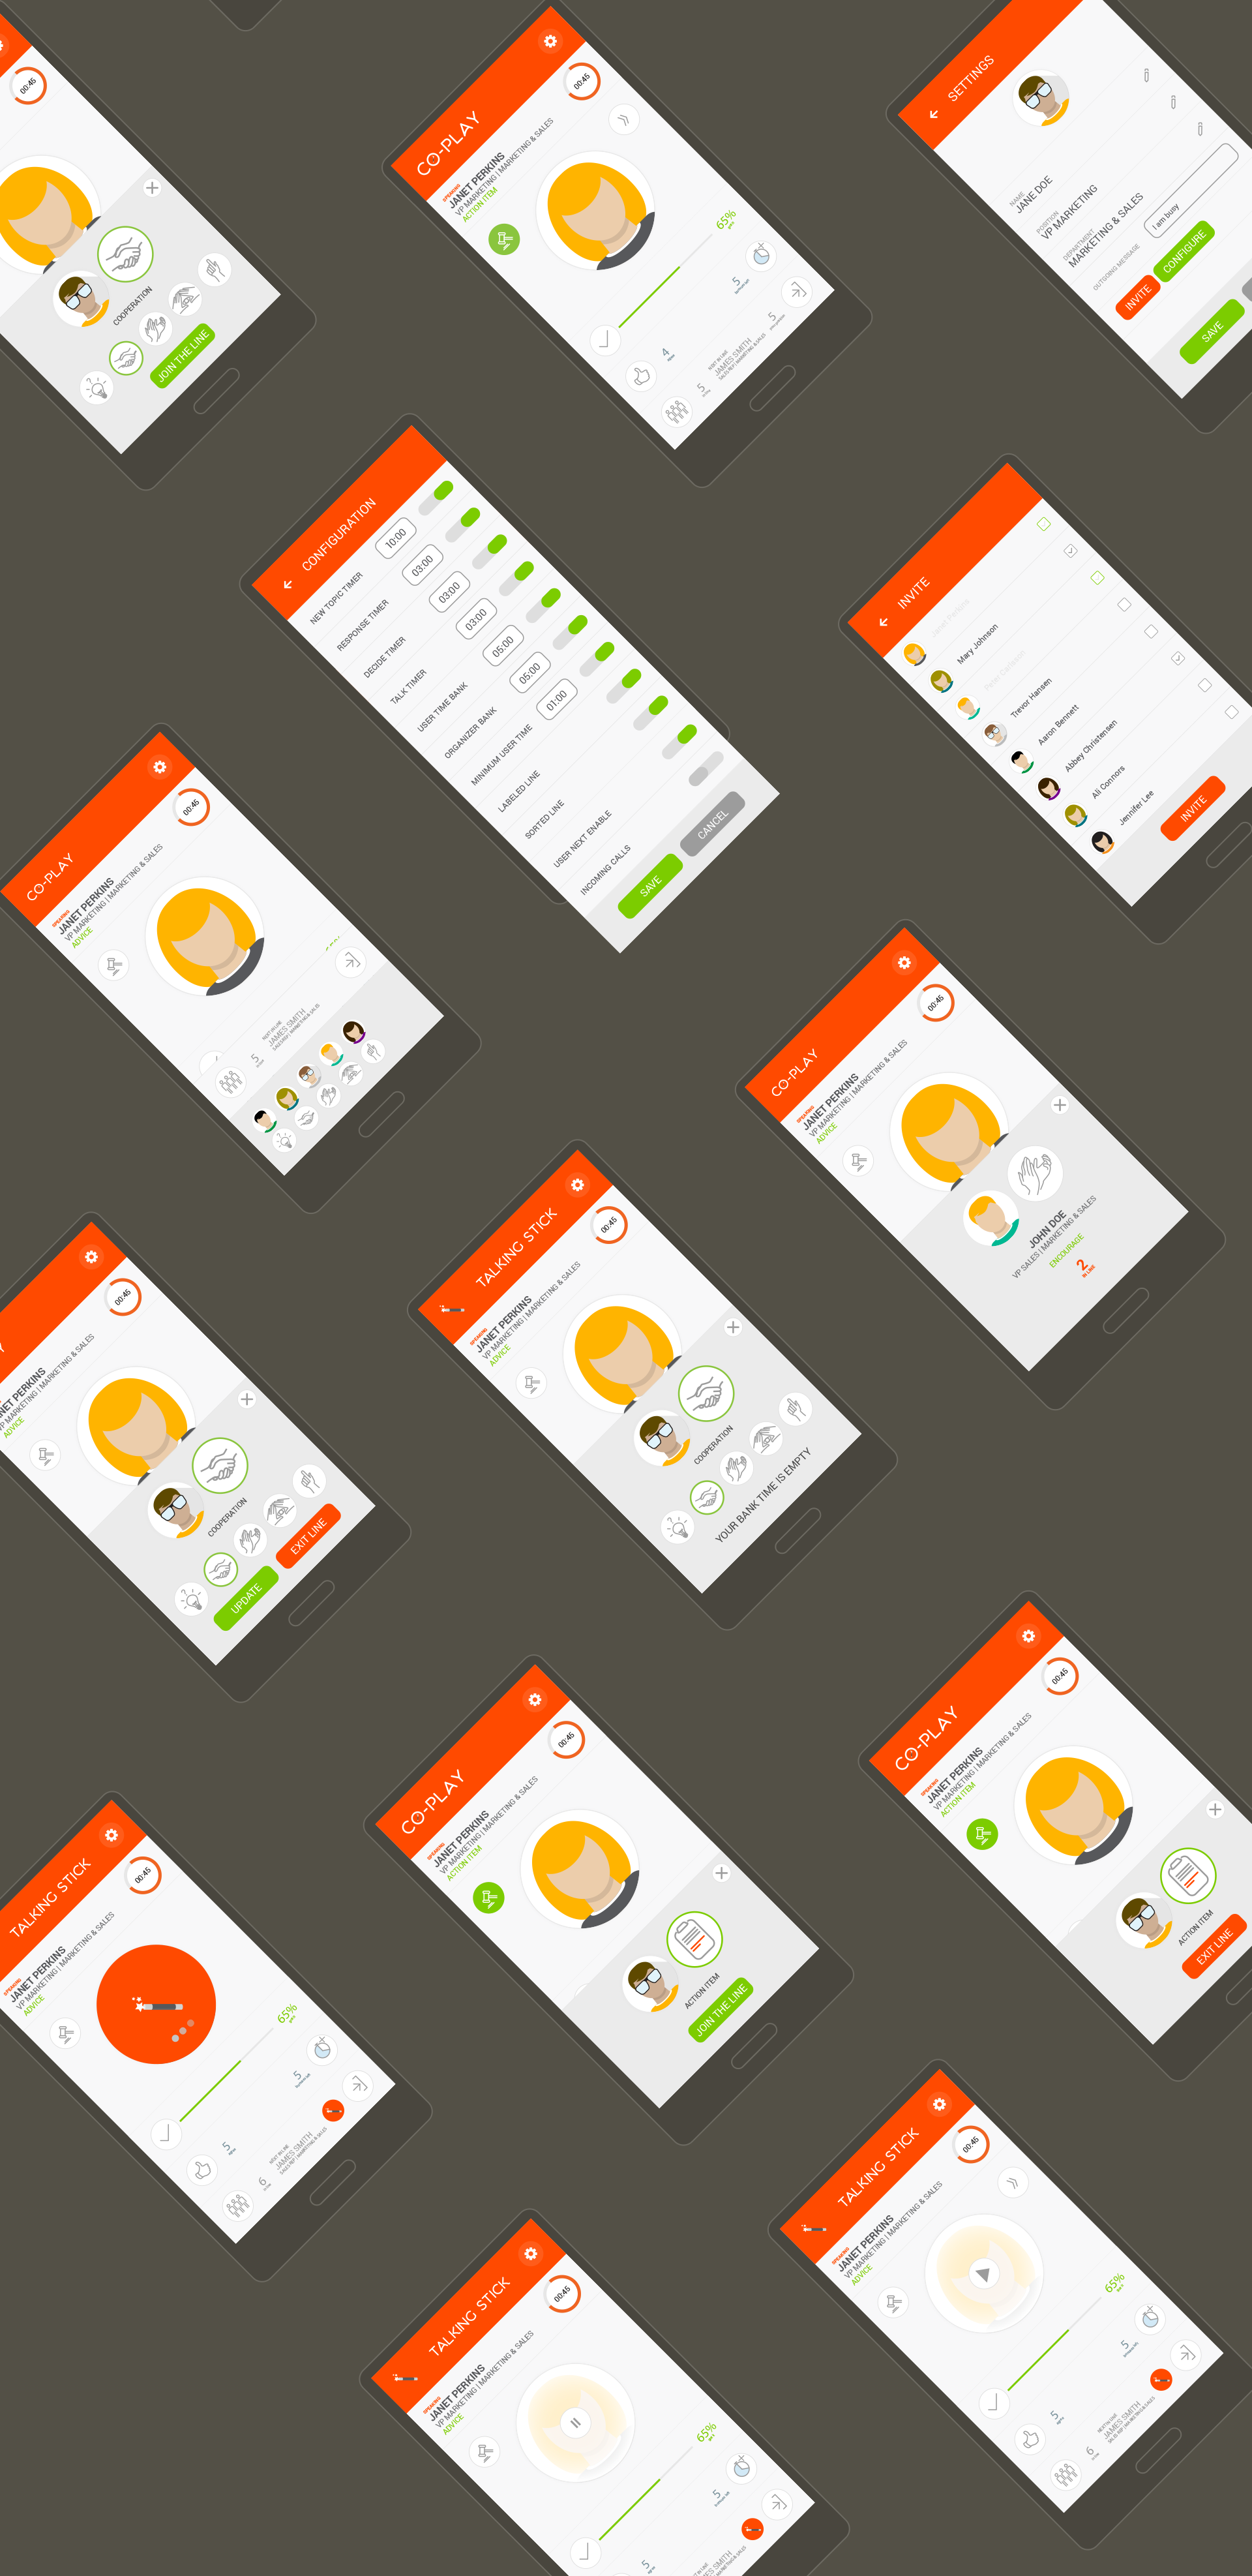 Mobile App design UI screens עיצוב אפליקציה עיצוב מסכי ממשק משתמש co-play